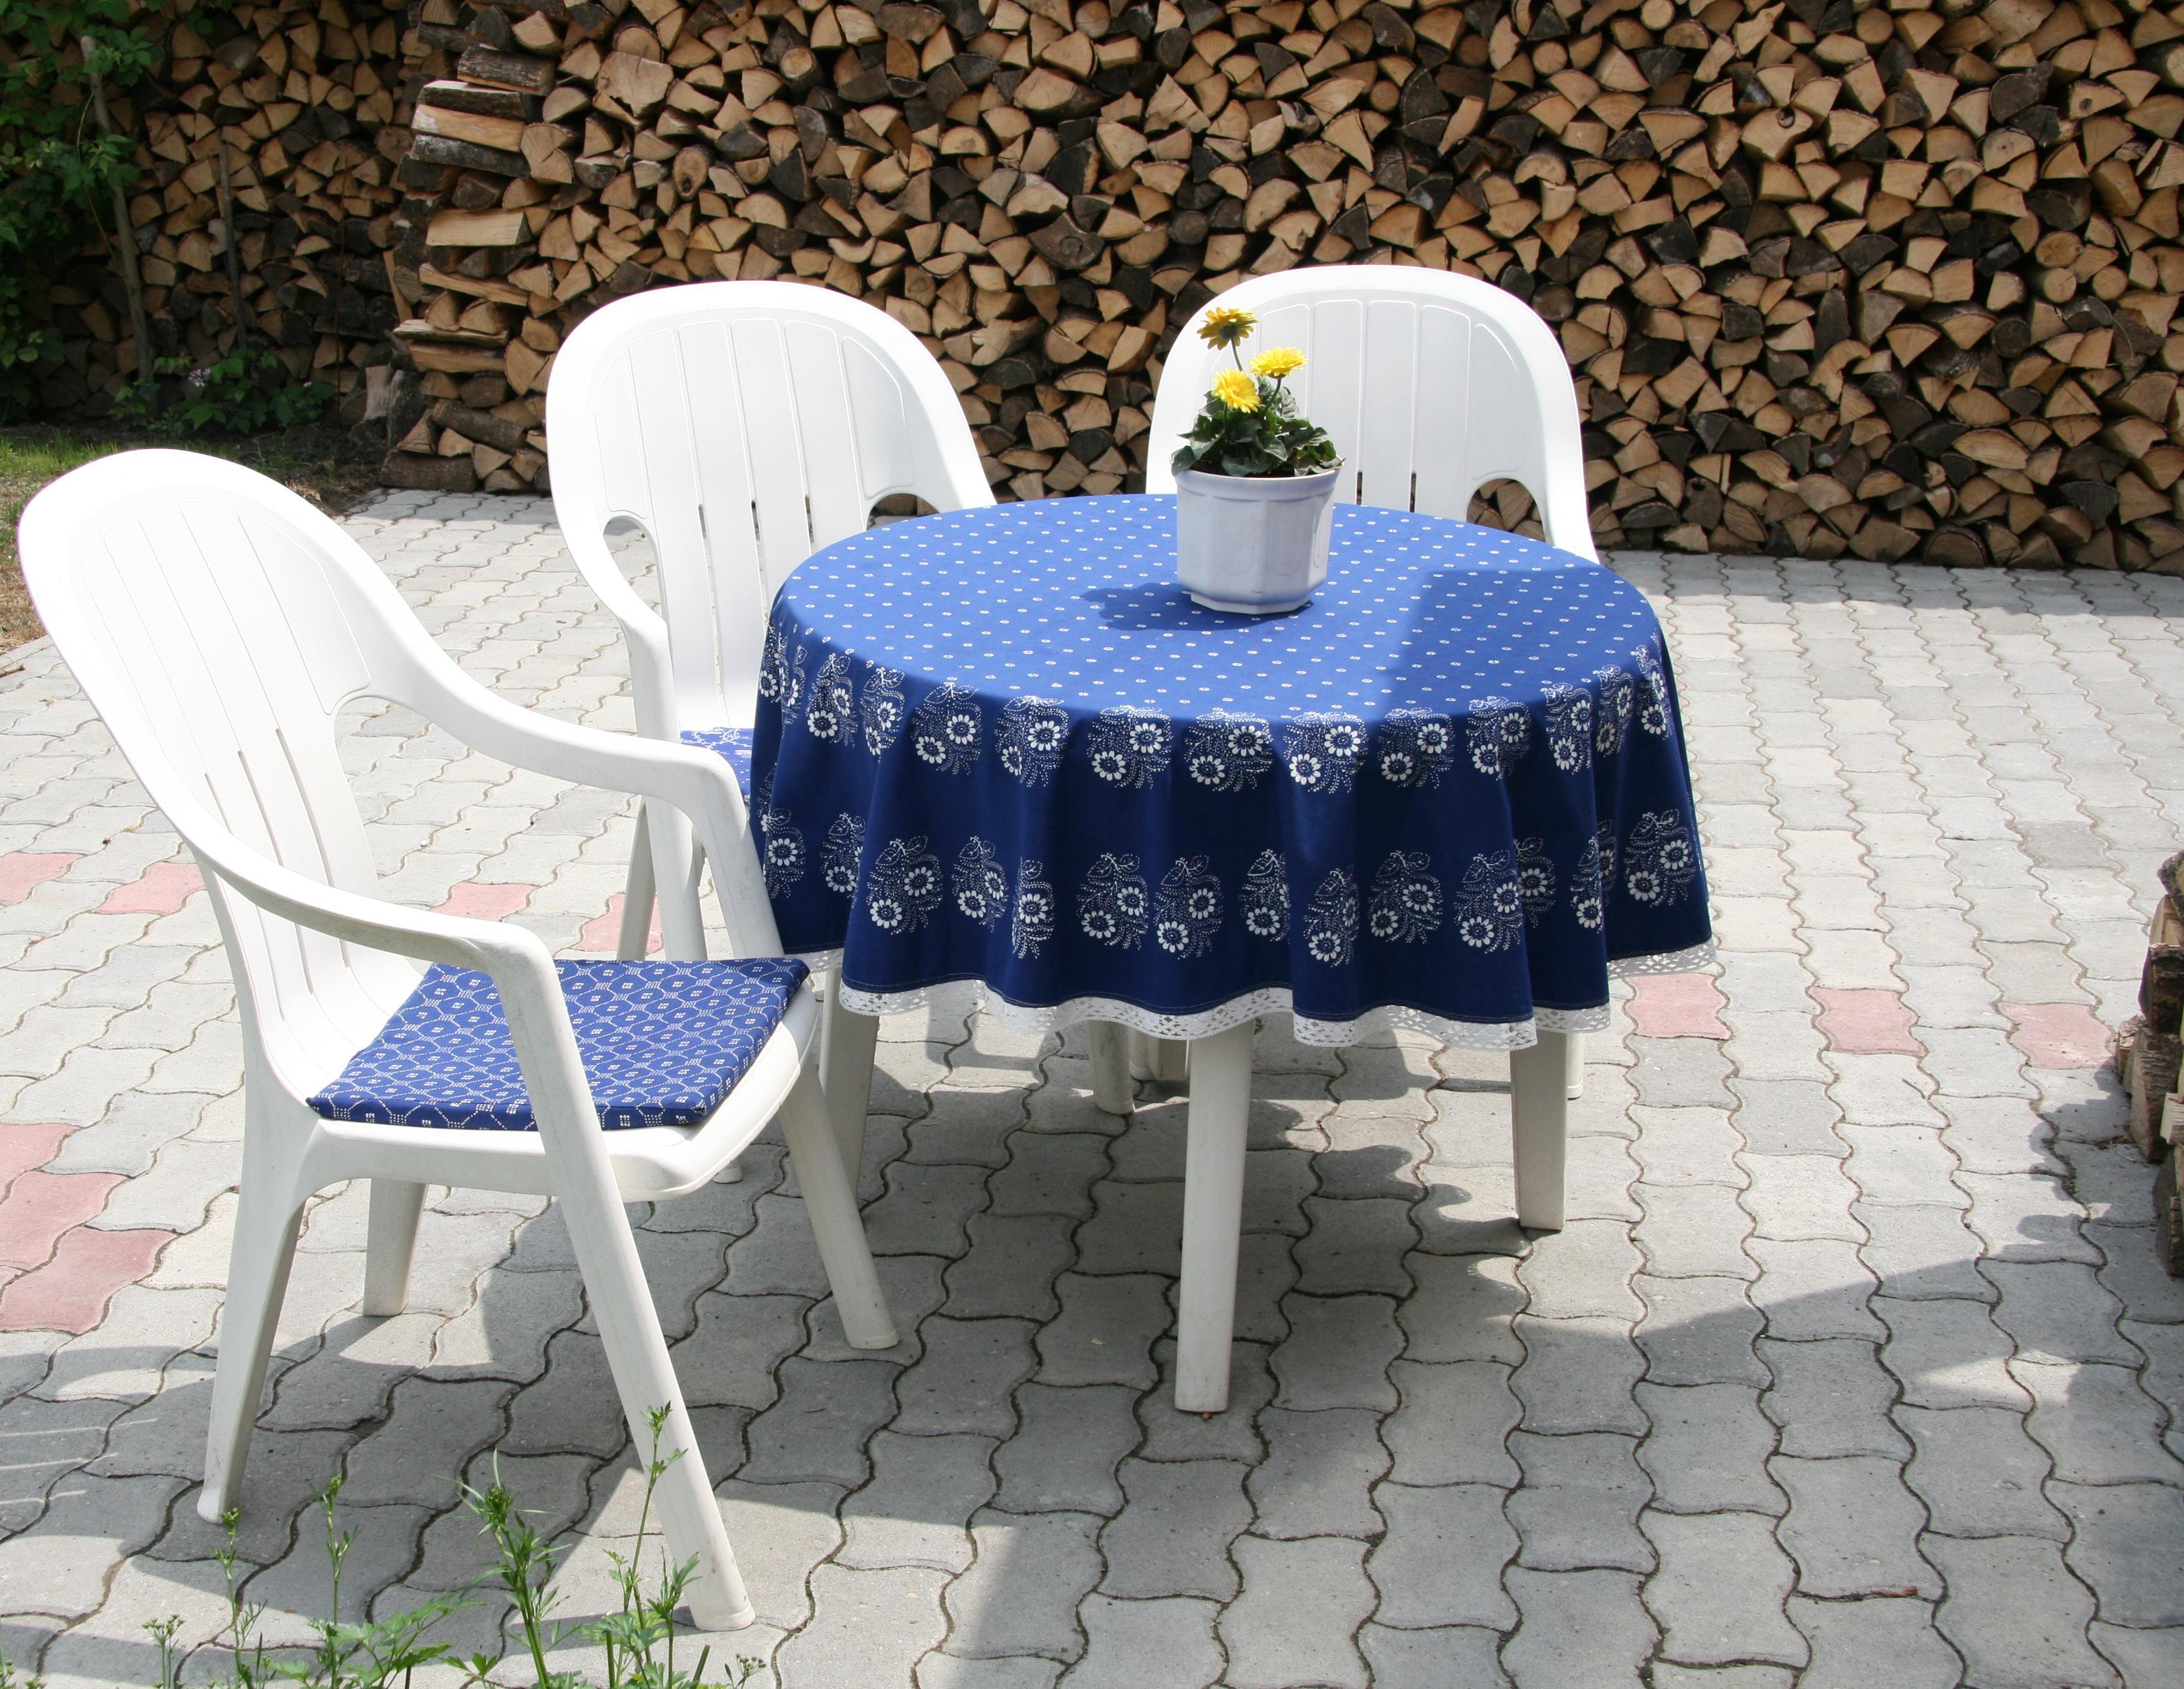 Blue dye tablecloth